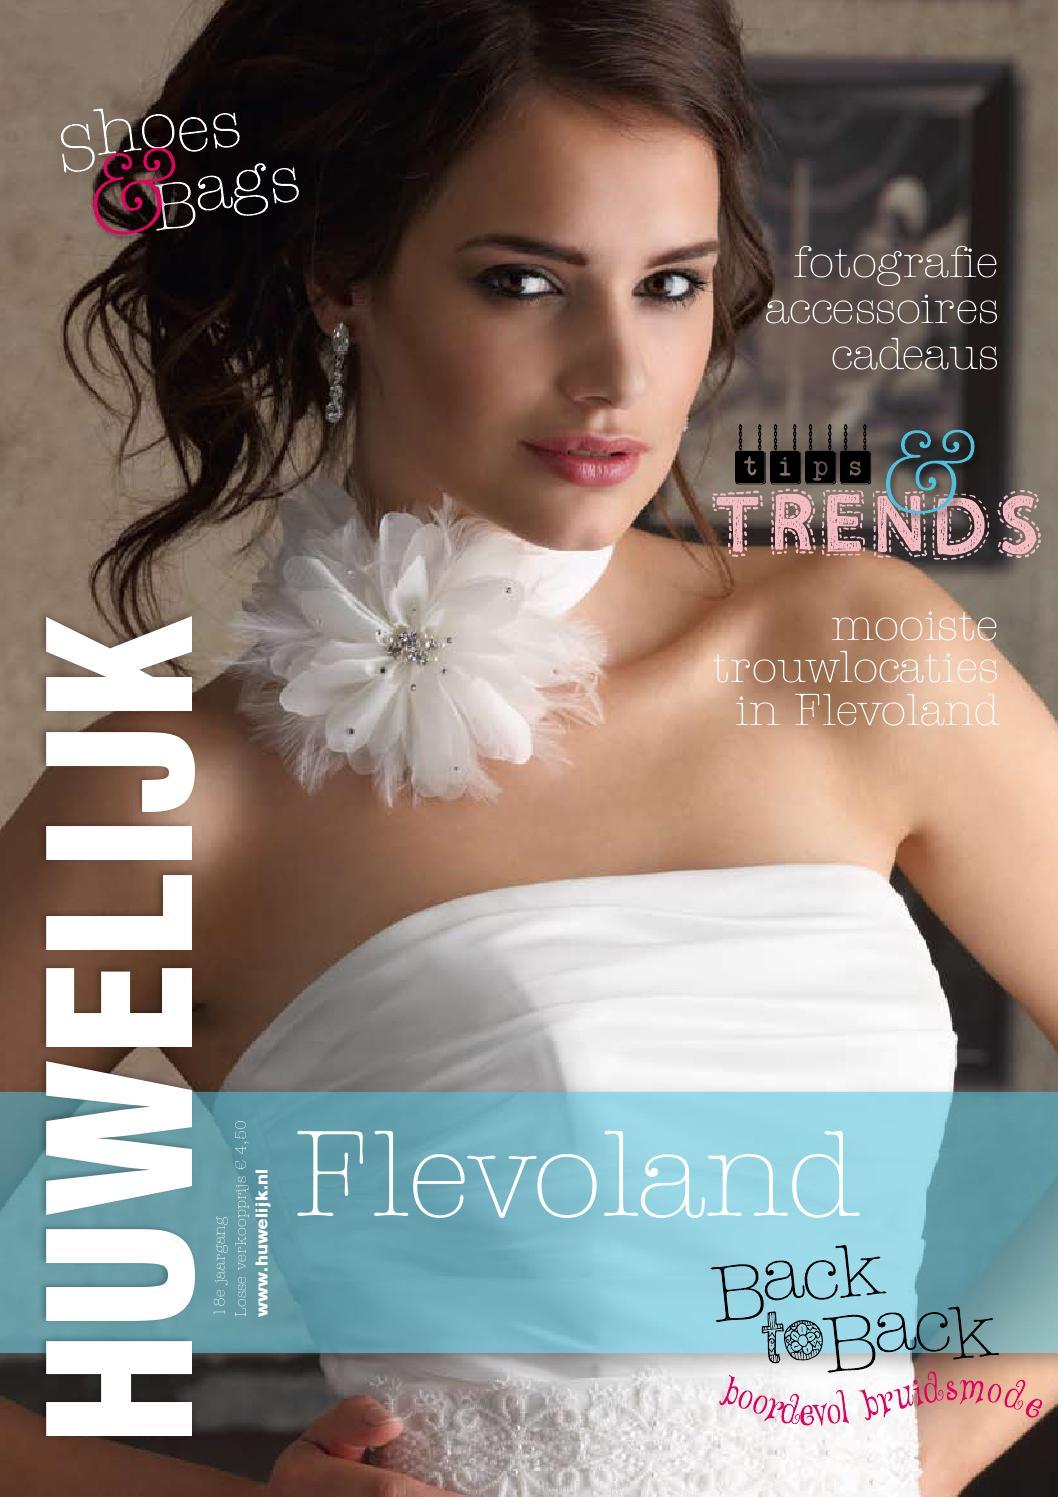 Huwelijk in flevoland 2014 by ward media   issuu